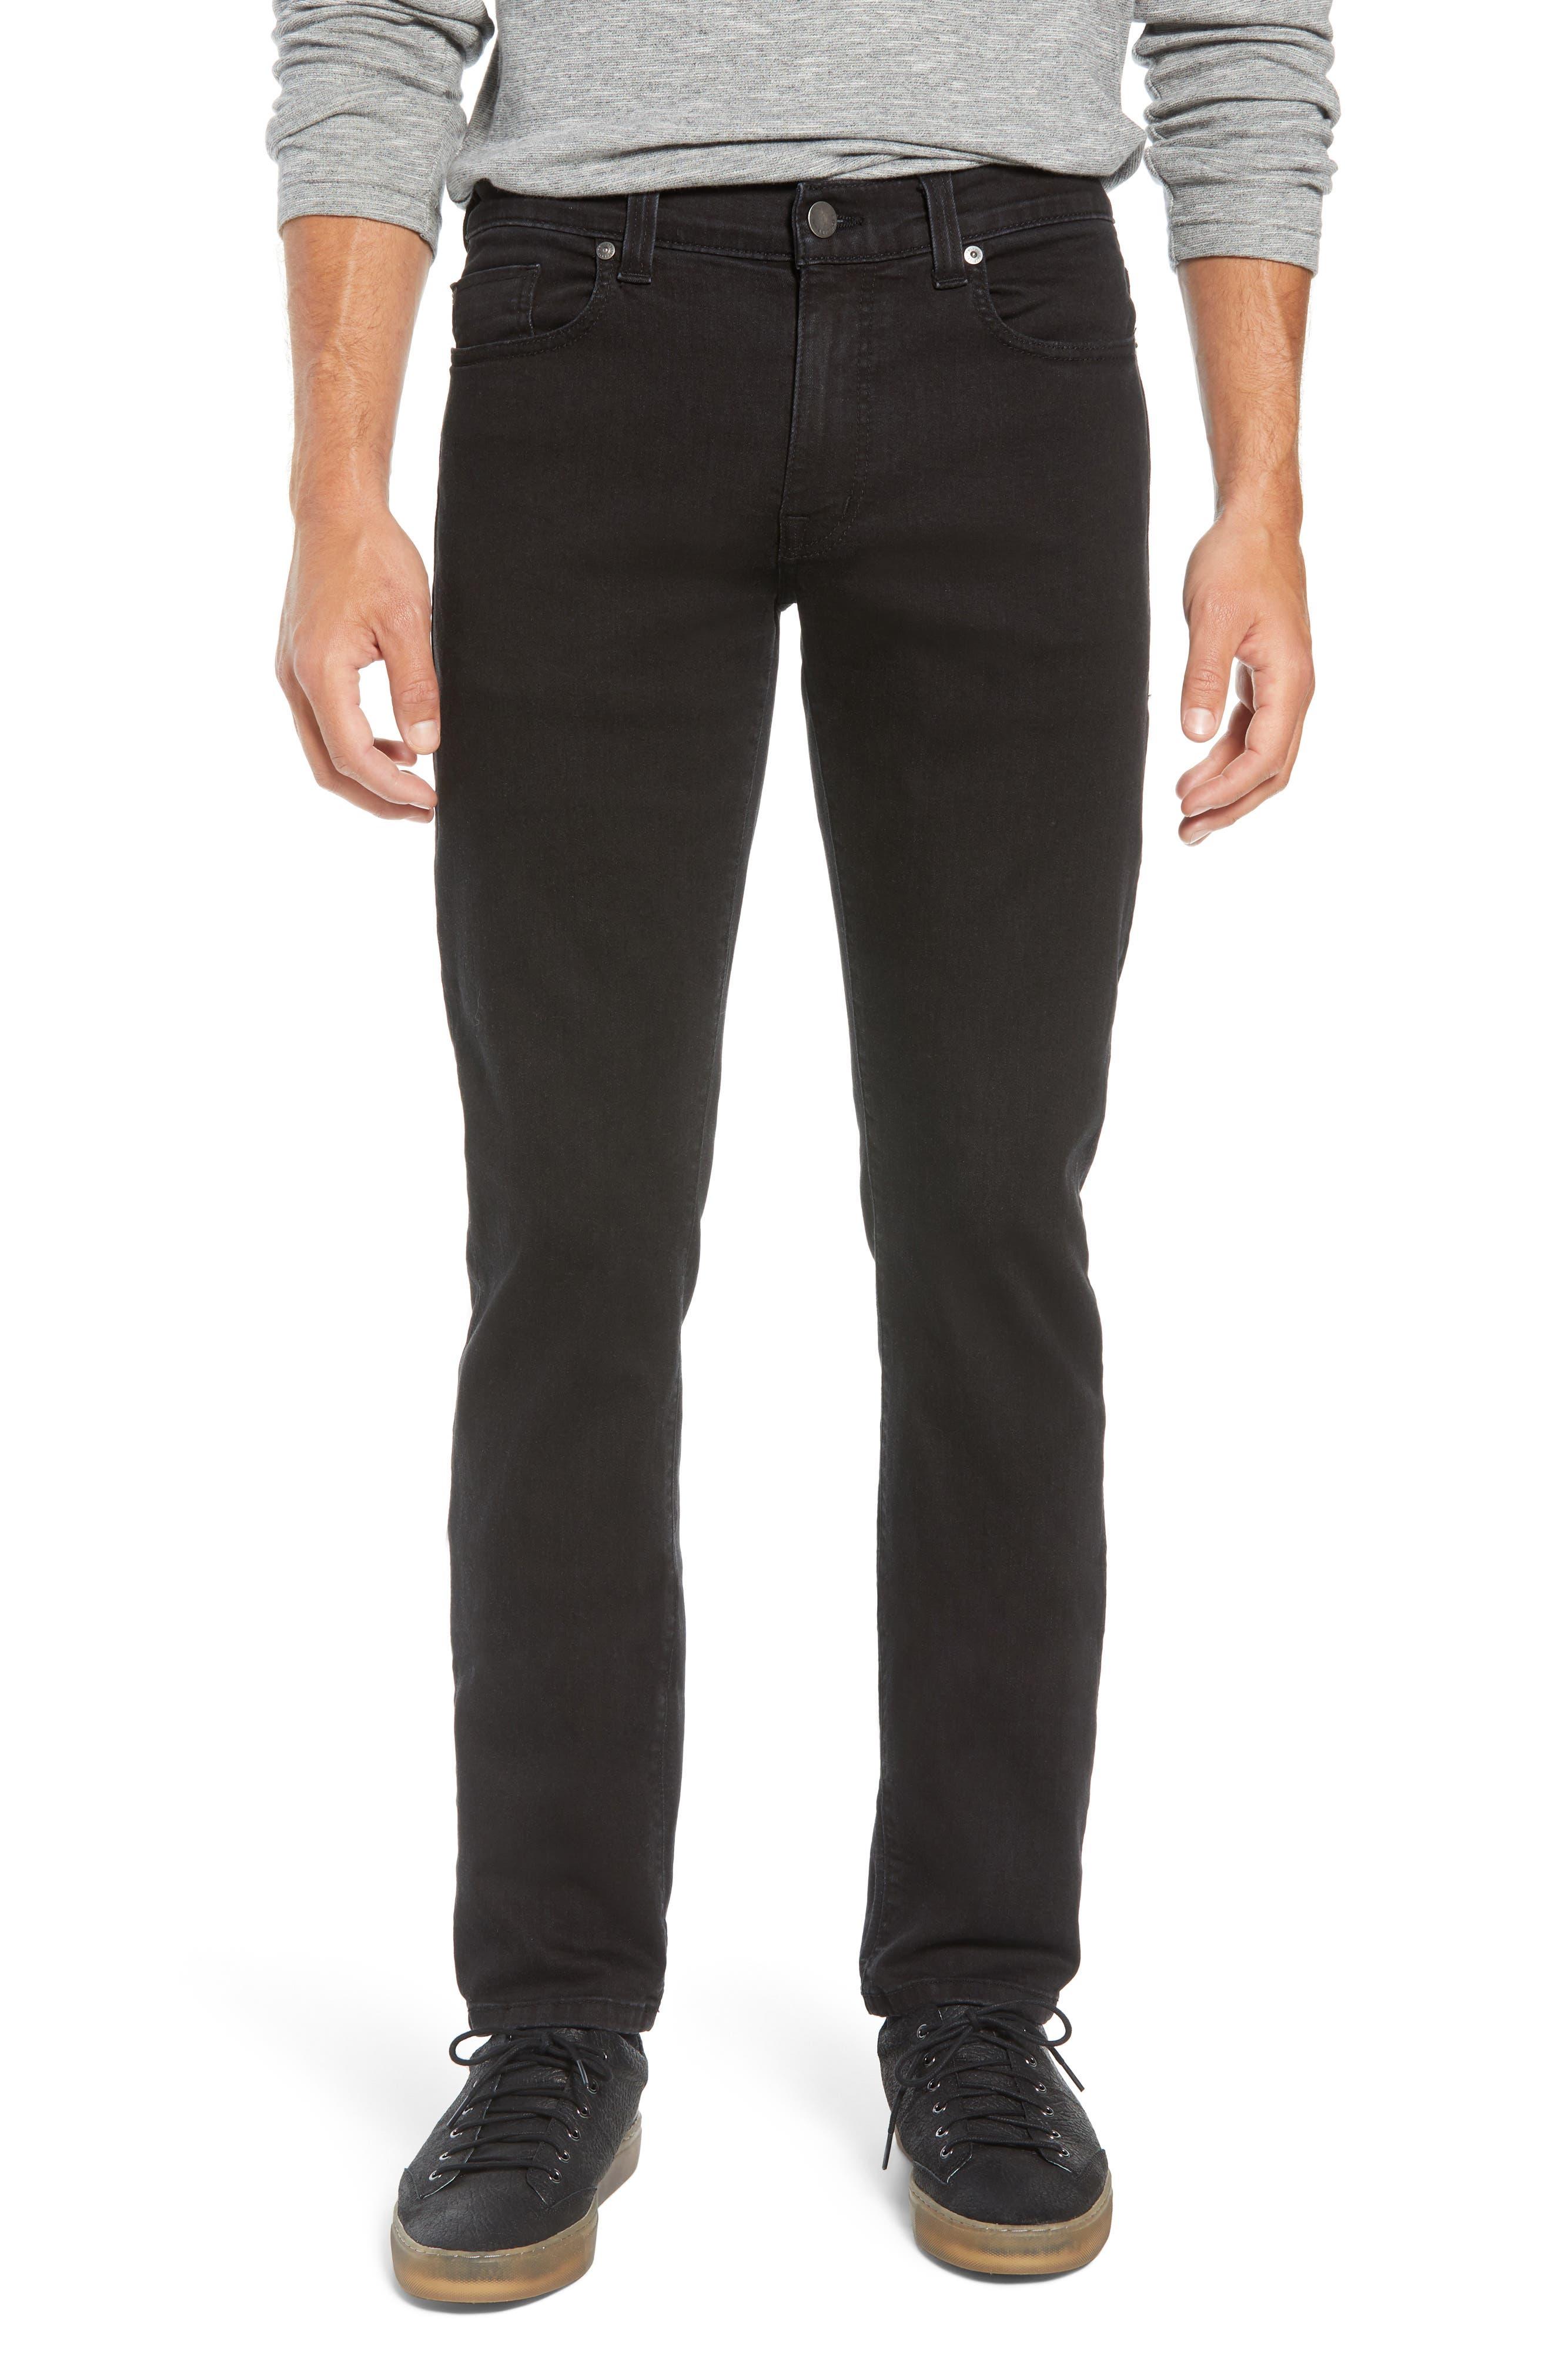 Torino Slim Fit Jeans,                         Main,                         color, 400